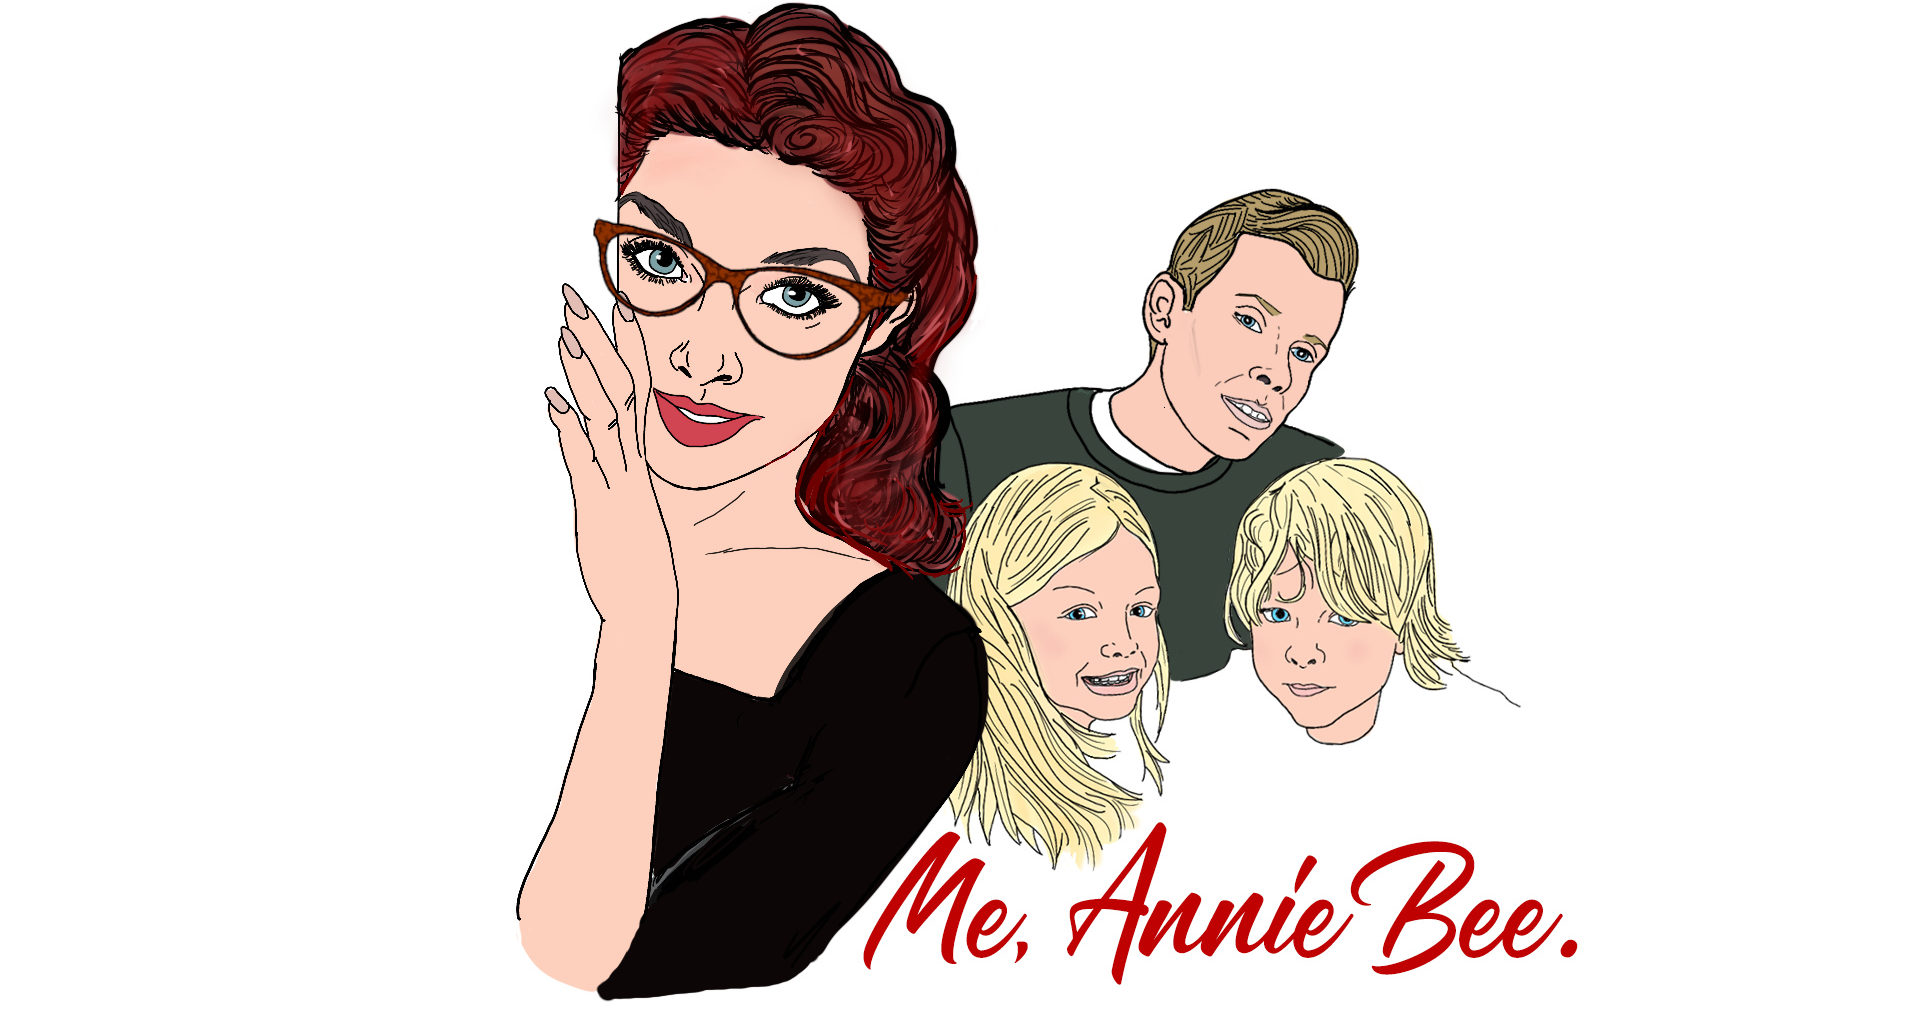 Me, Annie Bee.